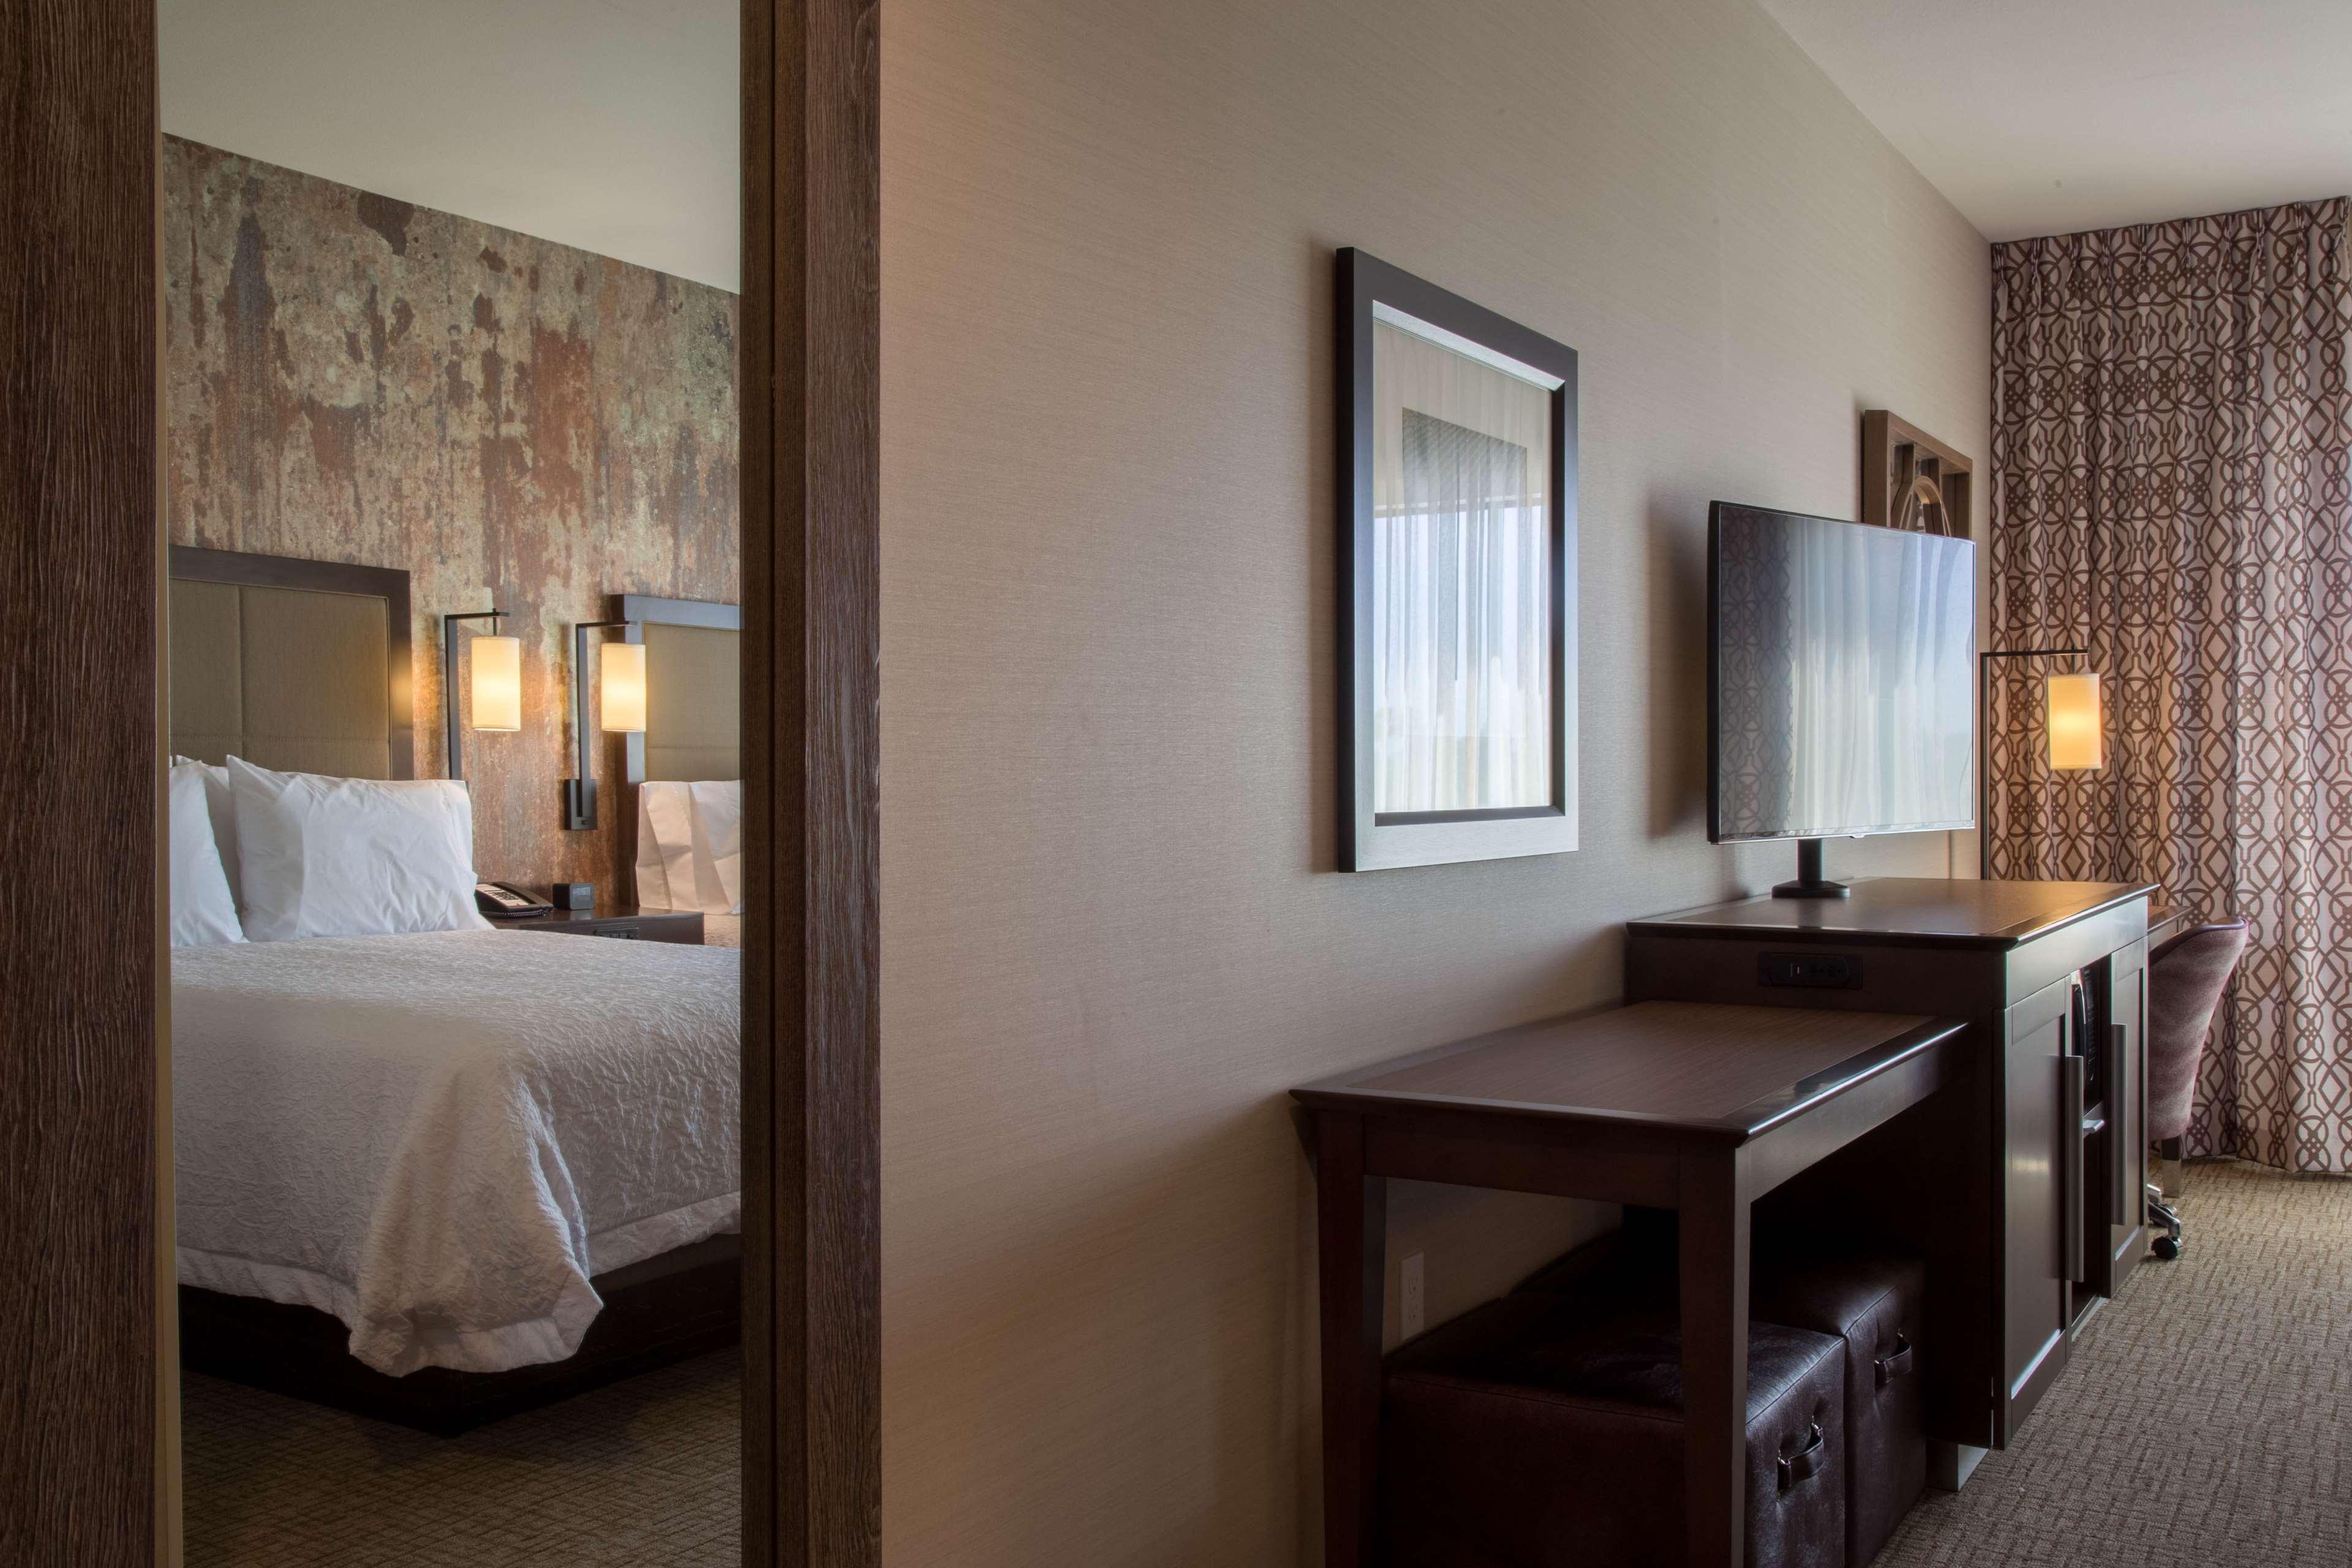 Hampton Inn & Suites Murrieta Temecula image 13